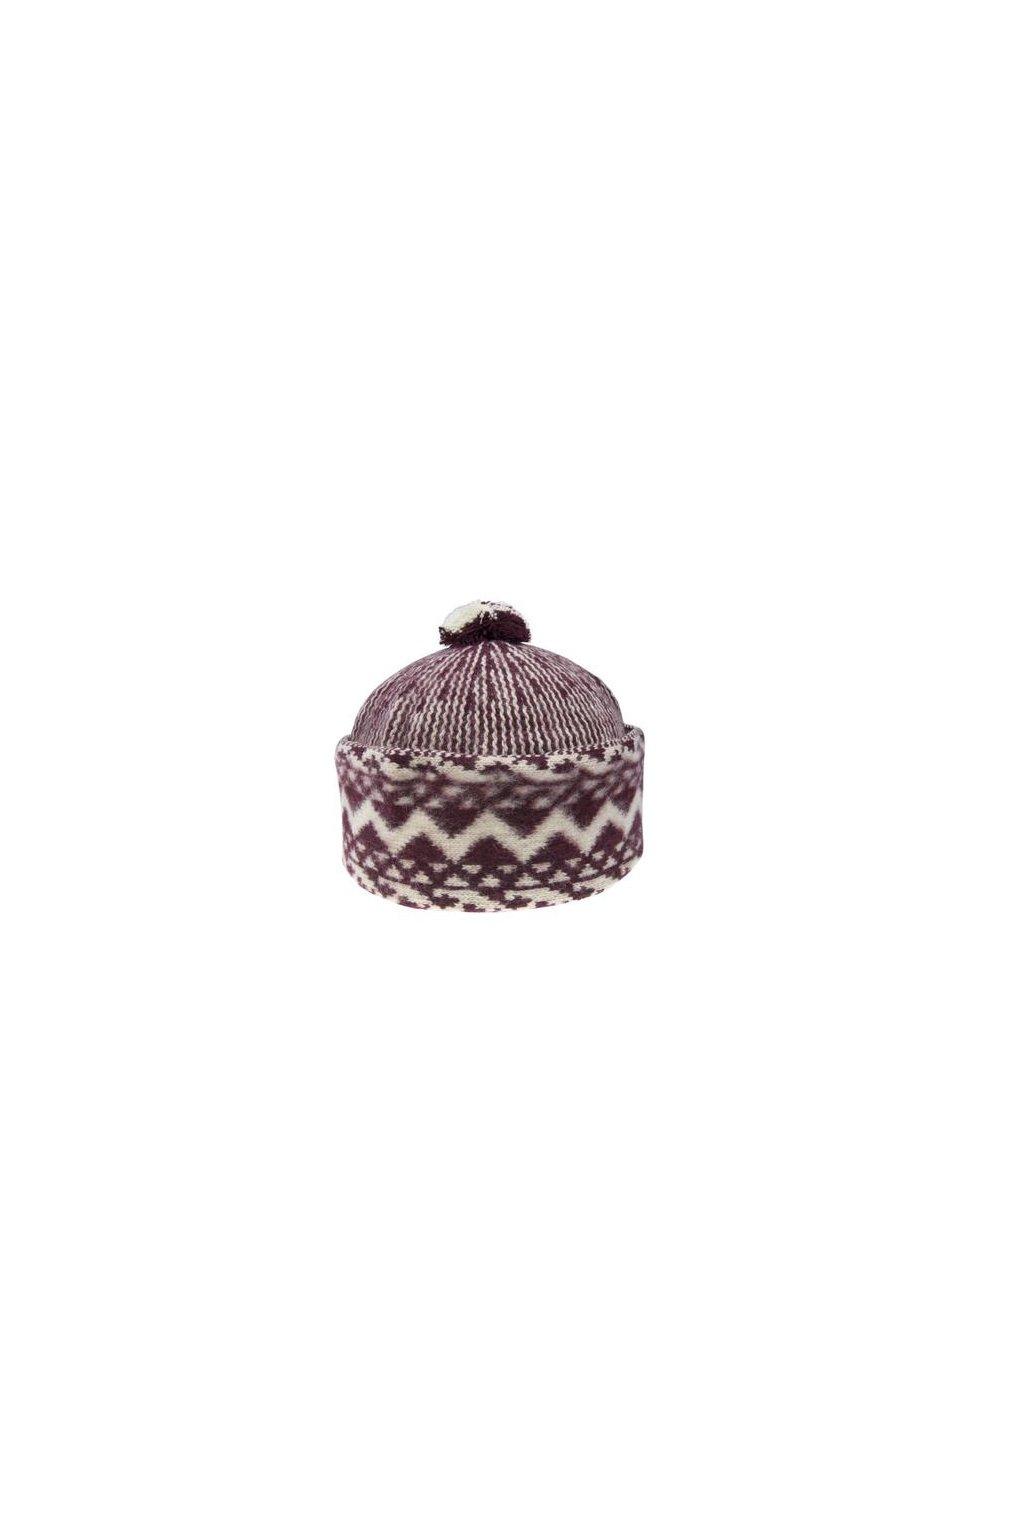 Triton 011 000002 cepice pletena vlnena zmijovka bordo